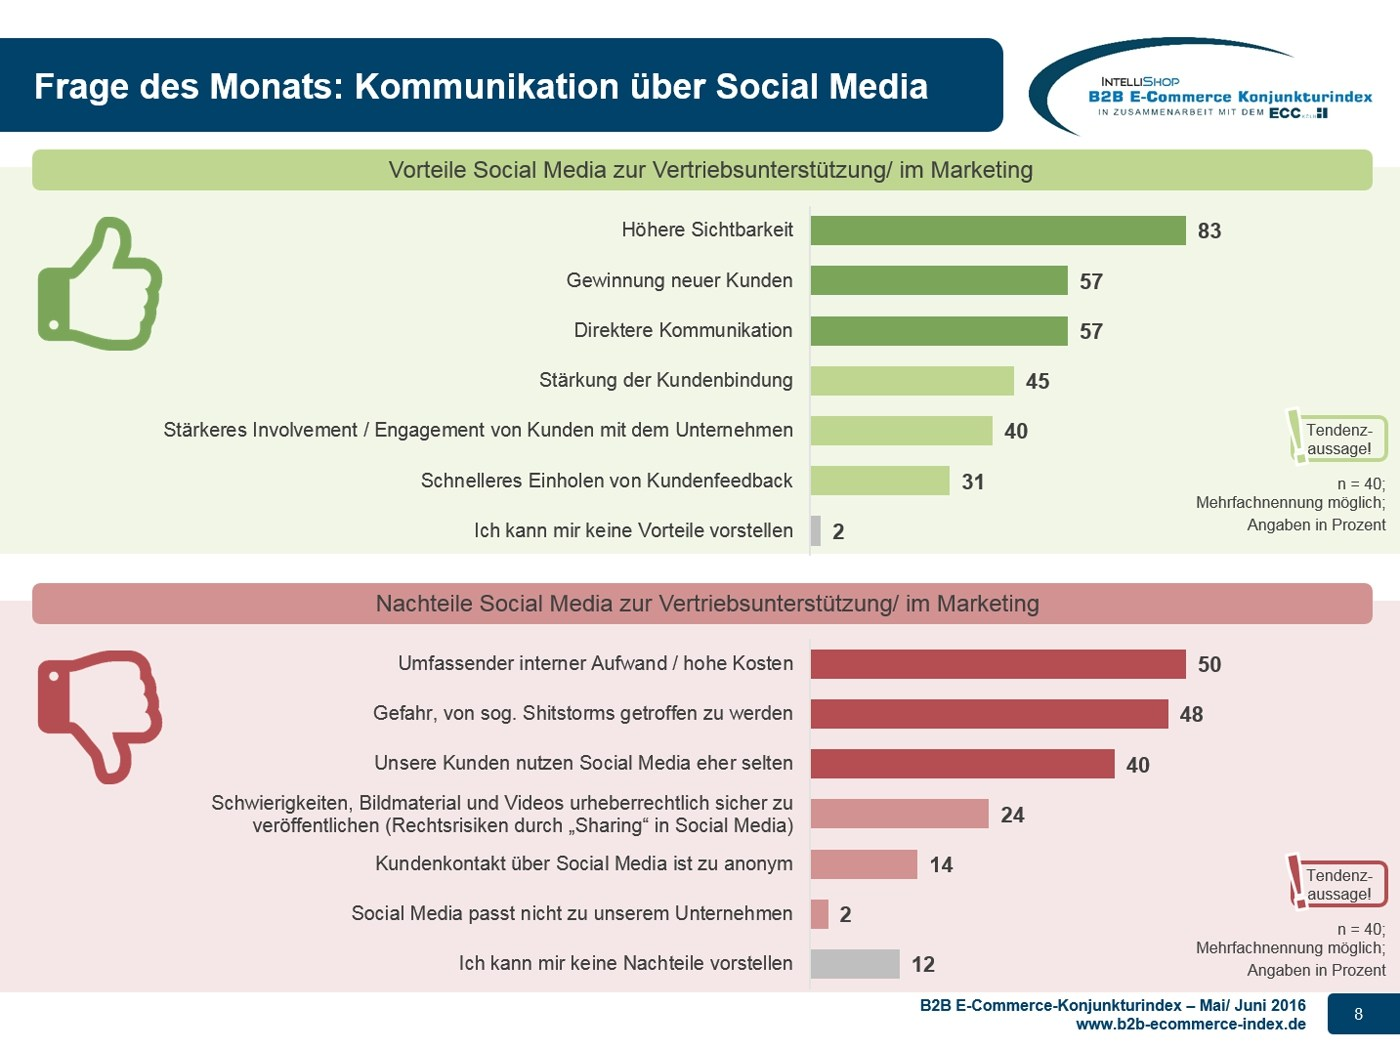 grafik intellishop ecc konjunkturindex-05_06-2016-zusatzfrage-social-media